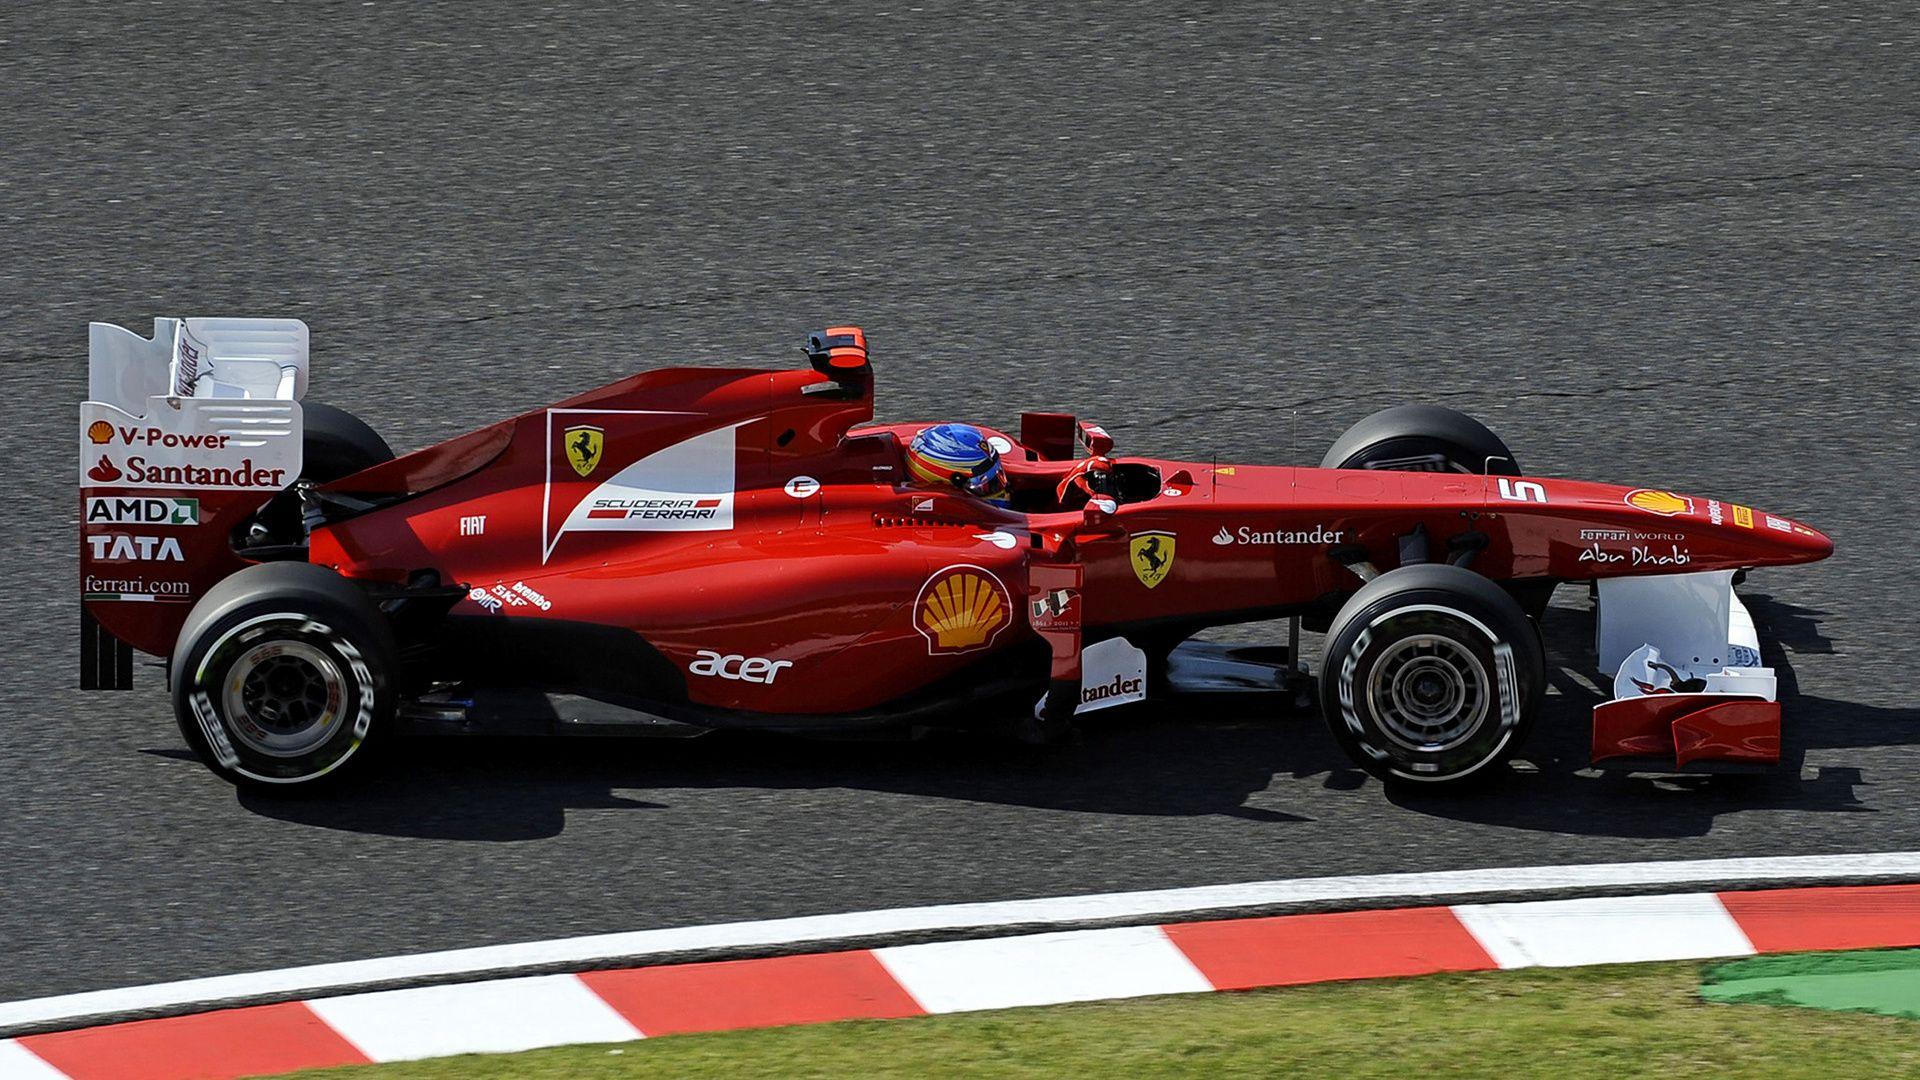 2011 Ferrari 150 Italia Fernando Alonso